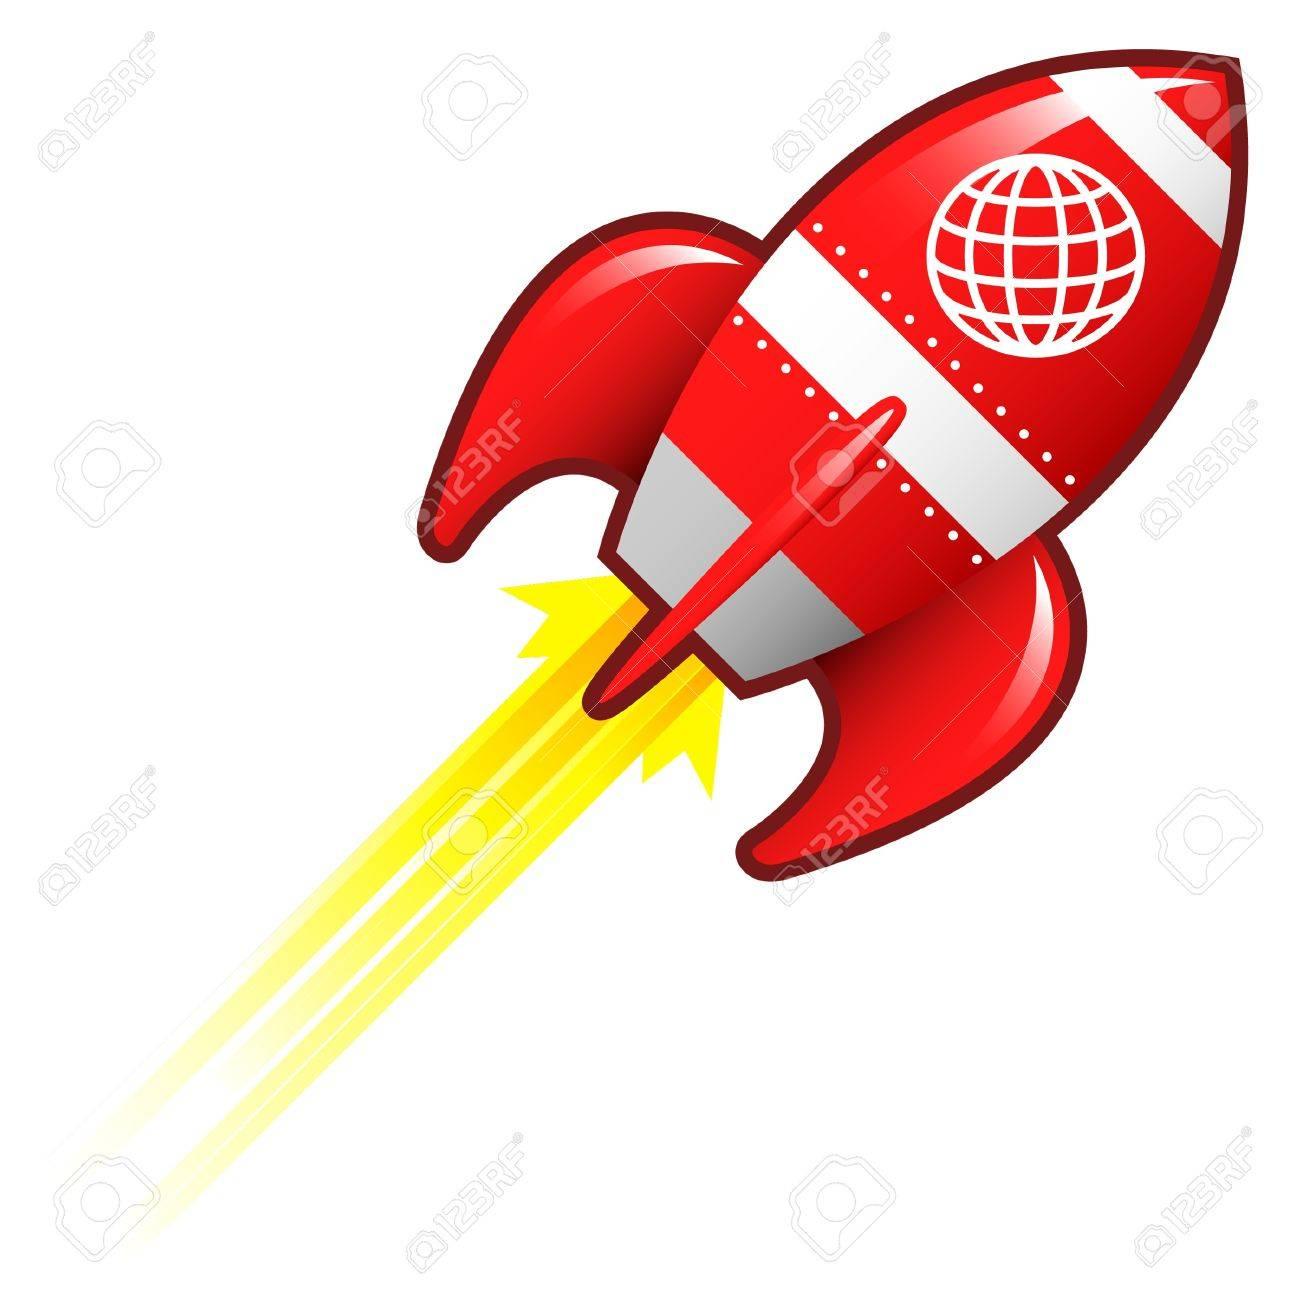 Globe icon on red retro rocket ship illustration Stock Illustration - 14417353